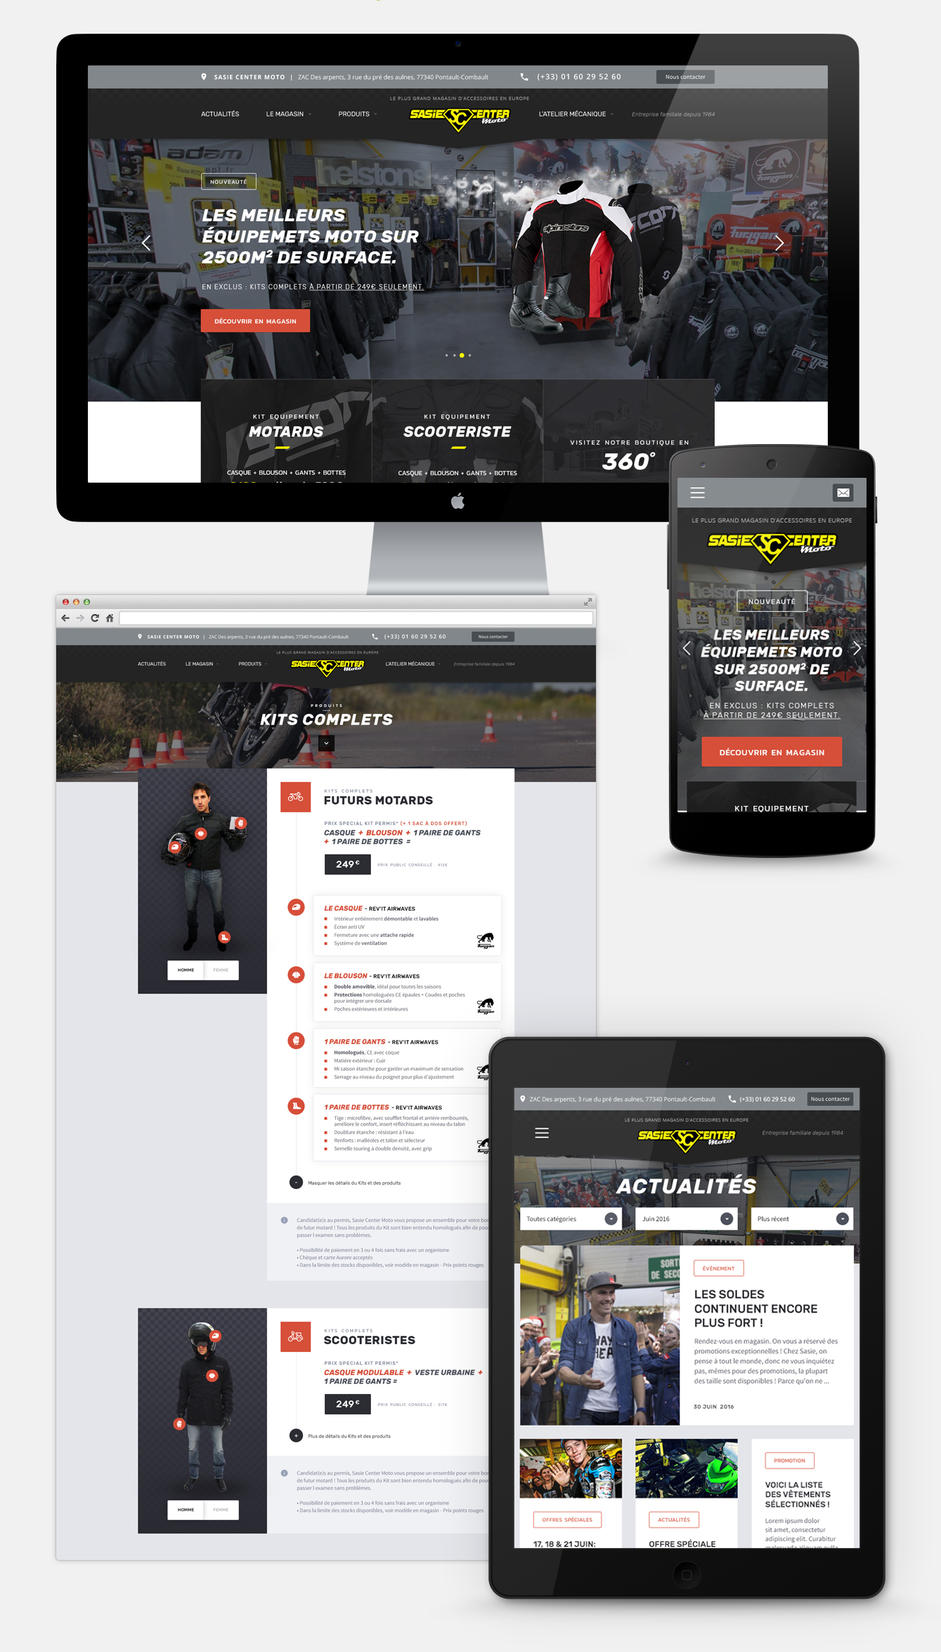 sasie center moto agence web paris. Black Bedroom Furniture Sets. Home Design Ideas